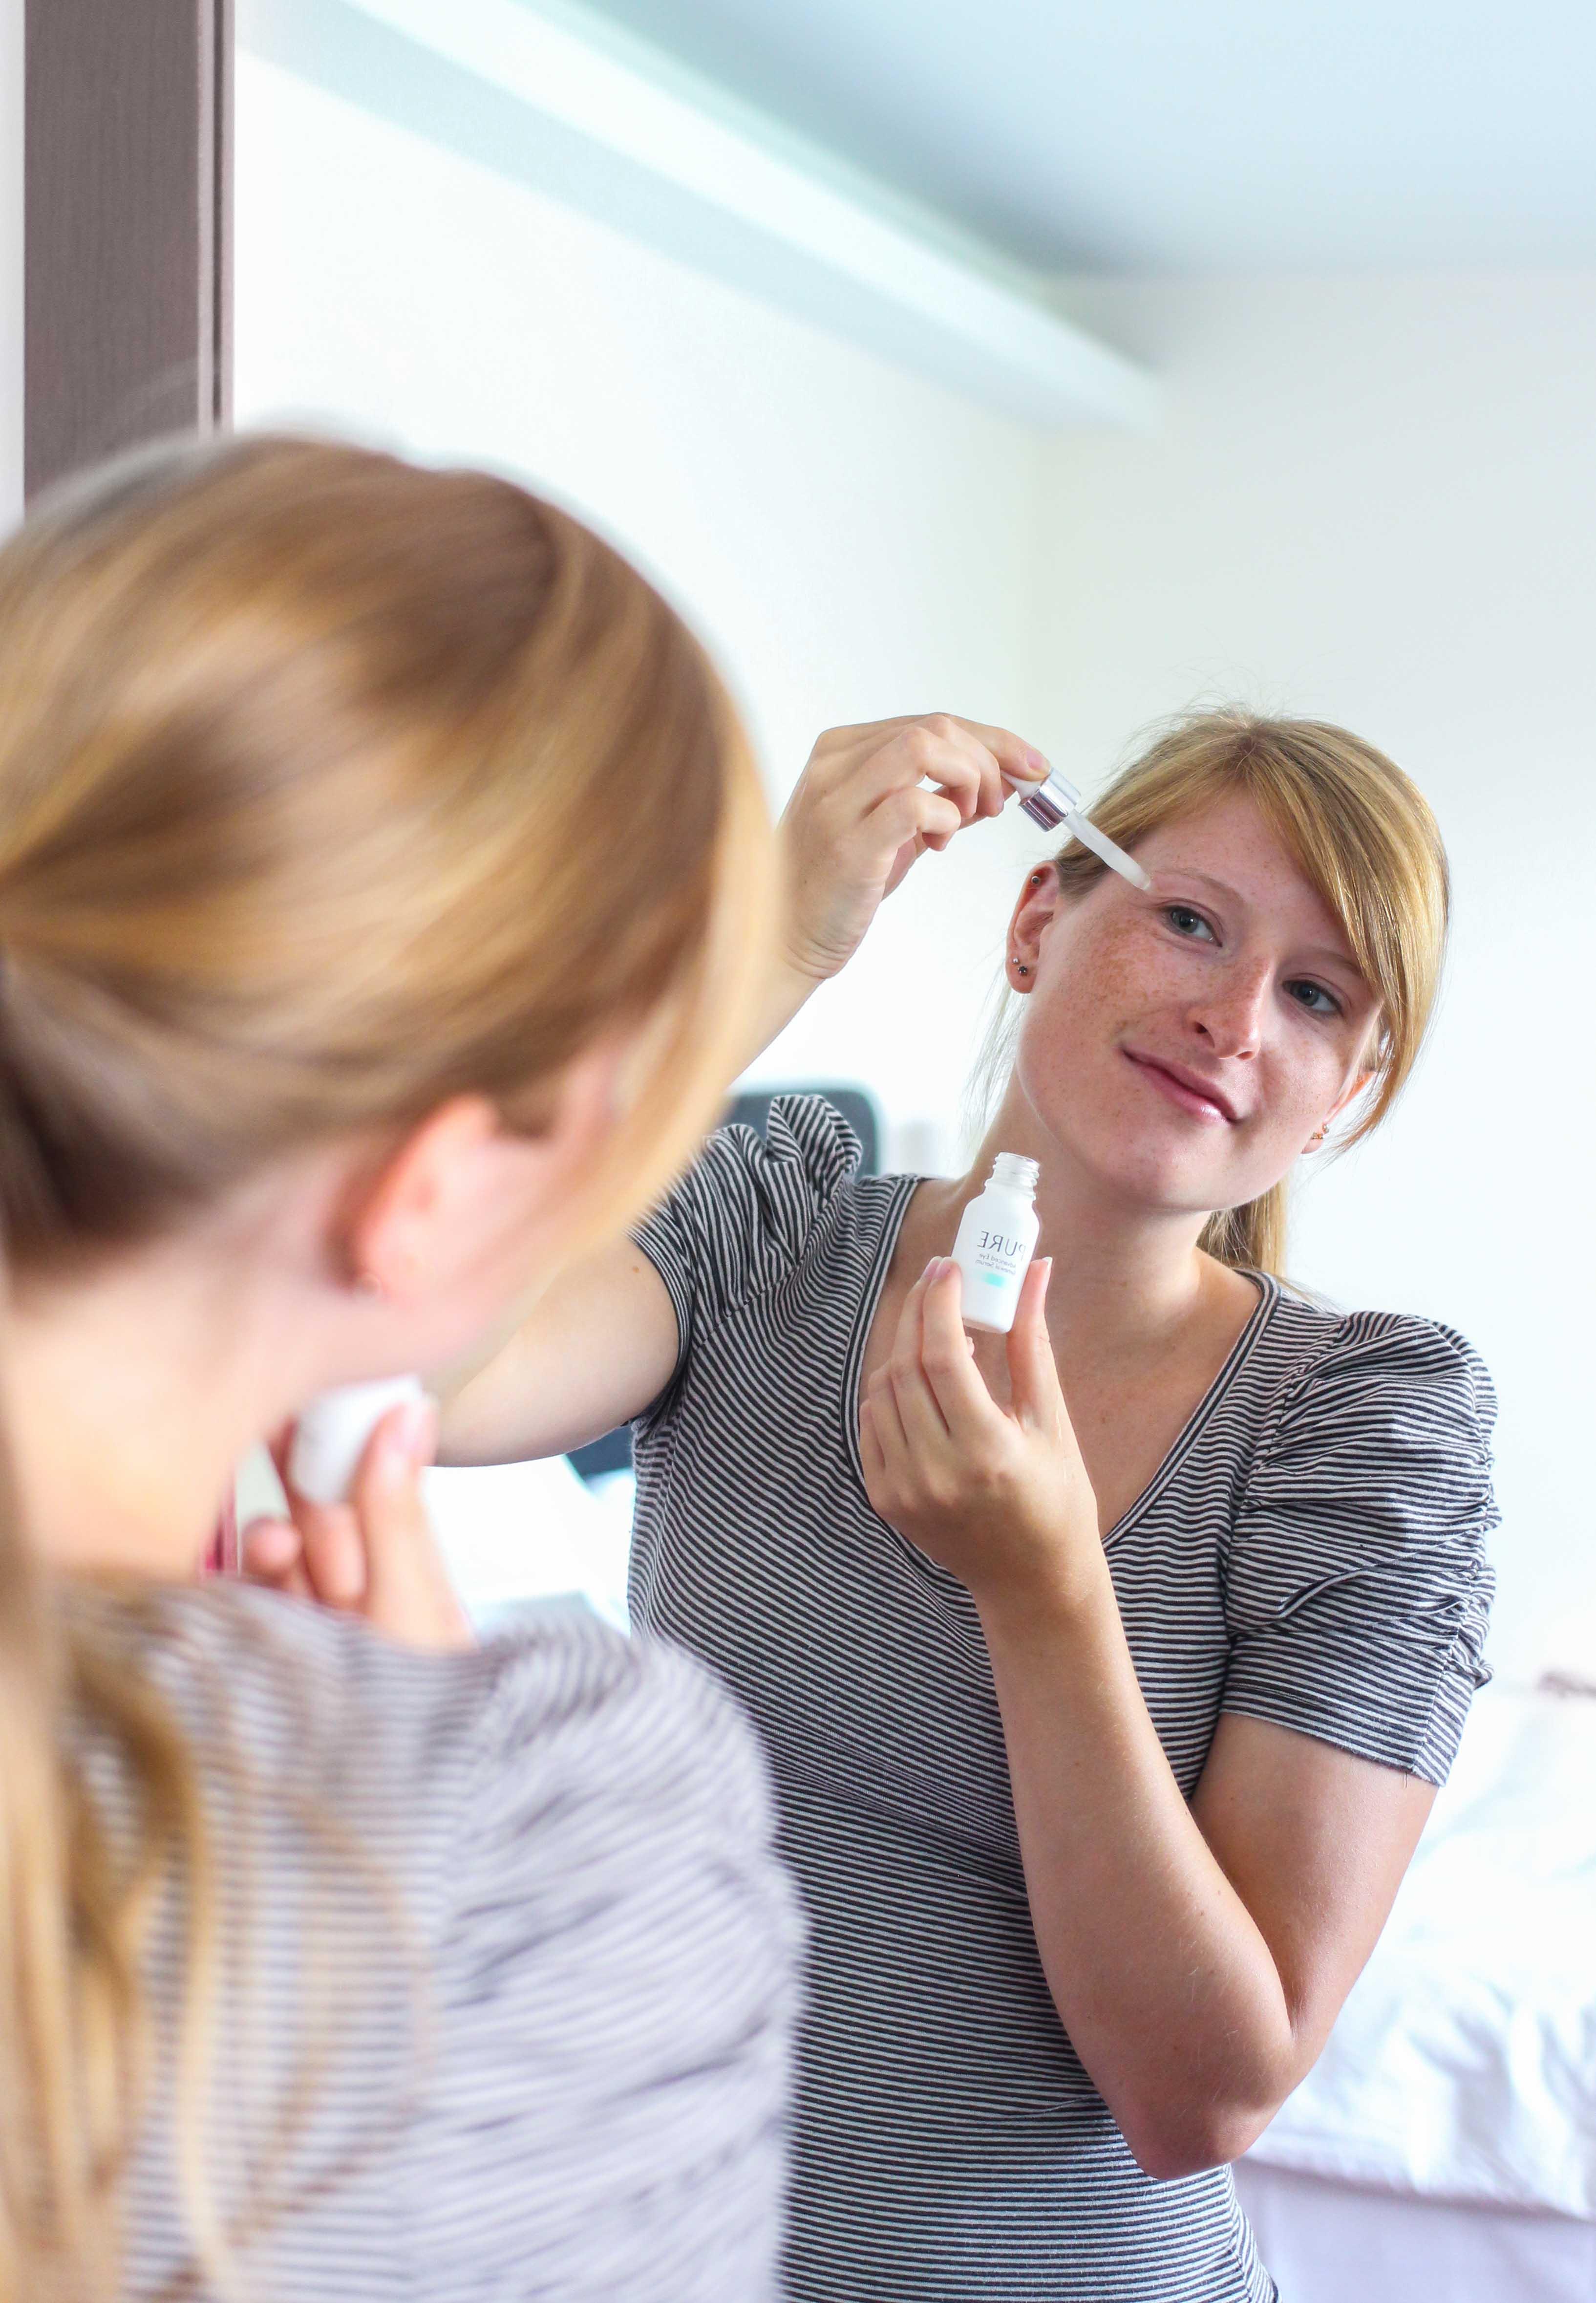 Beauty Augenpartie frische Haut PURE Serum gegen Falten Augenringe Orphica Beauty Blog Anwedung 2